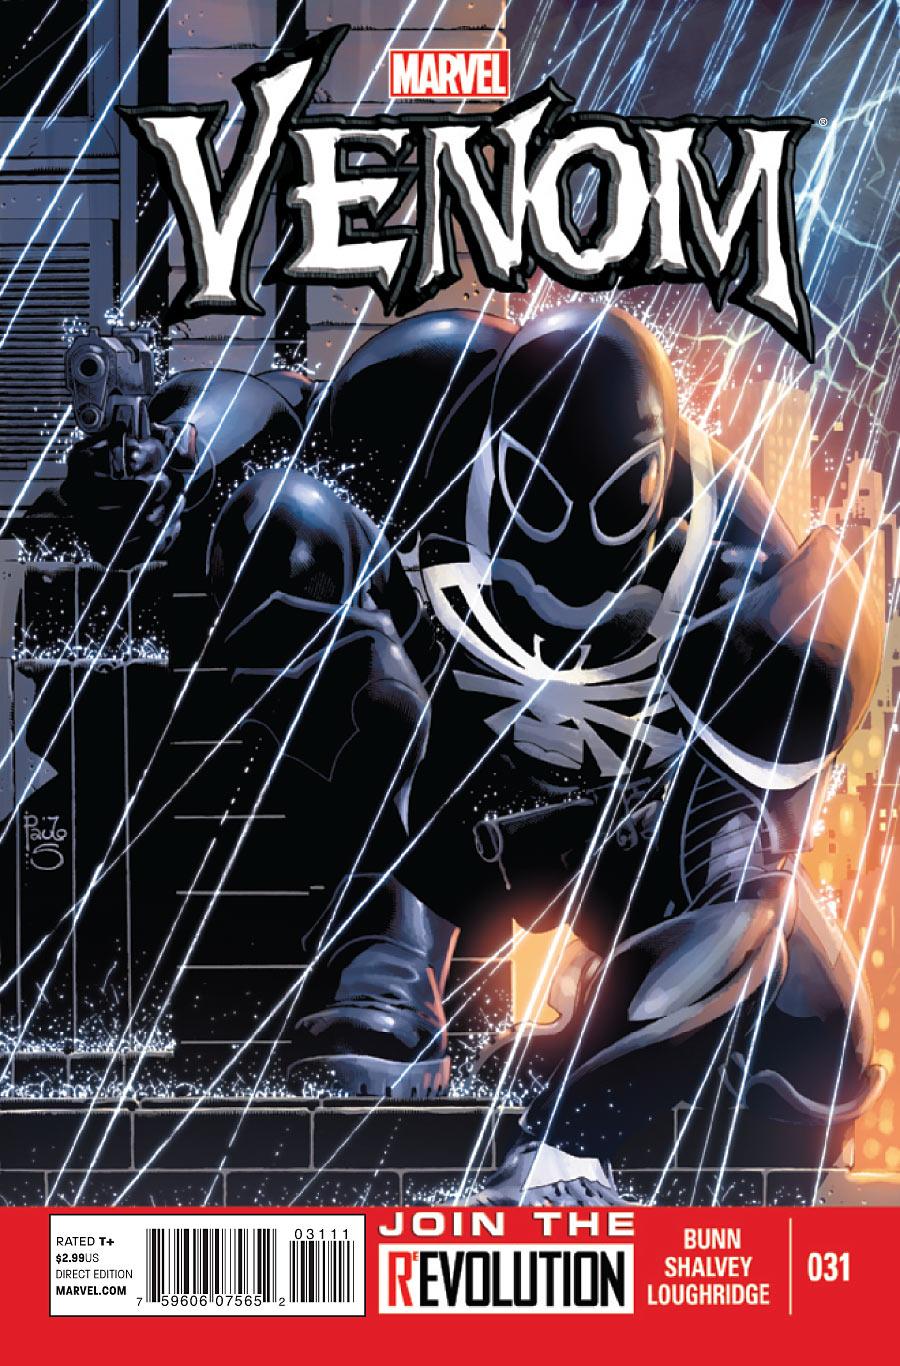 COMIC BOOK REVIEW: Venom #31